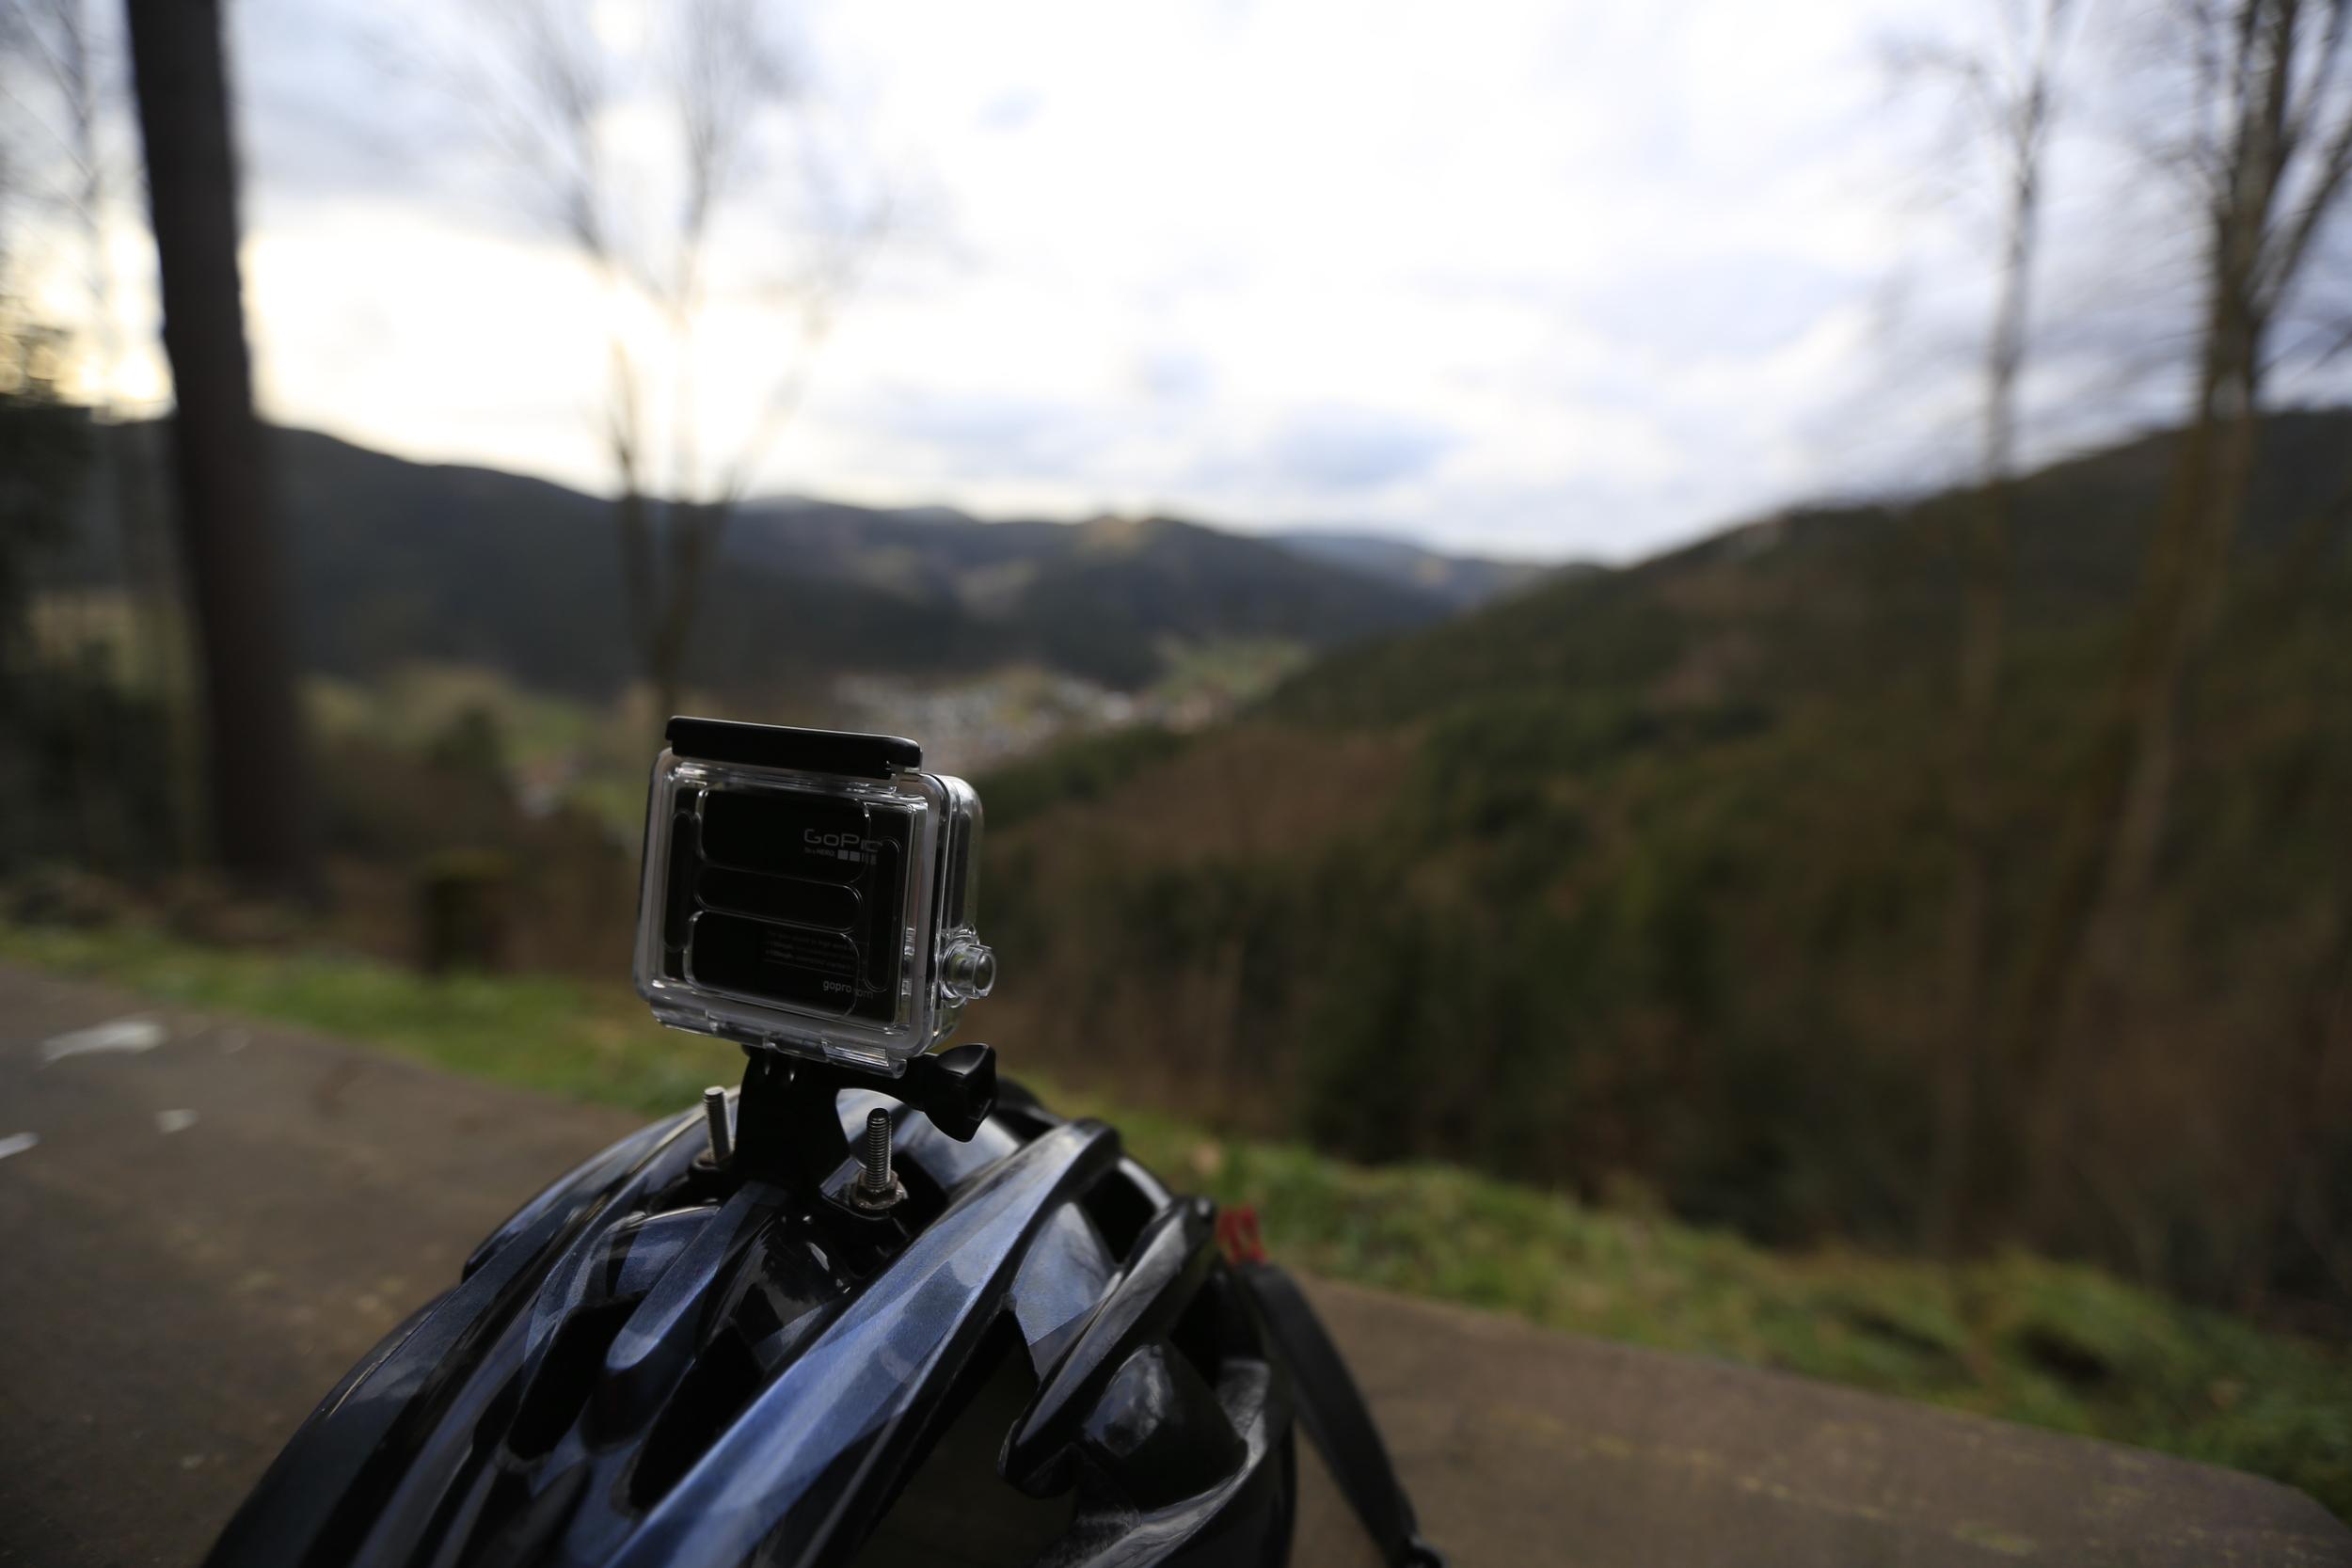 gopro, gopro hero 3, gopro hero 4, be a hero, bikepacking, bikepacking blog, cycling, cycling blog, travel, adventure, review, black forest, bikepacking, woodland, singletrack, helmet, mtb, mountain biking